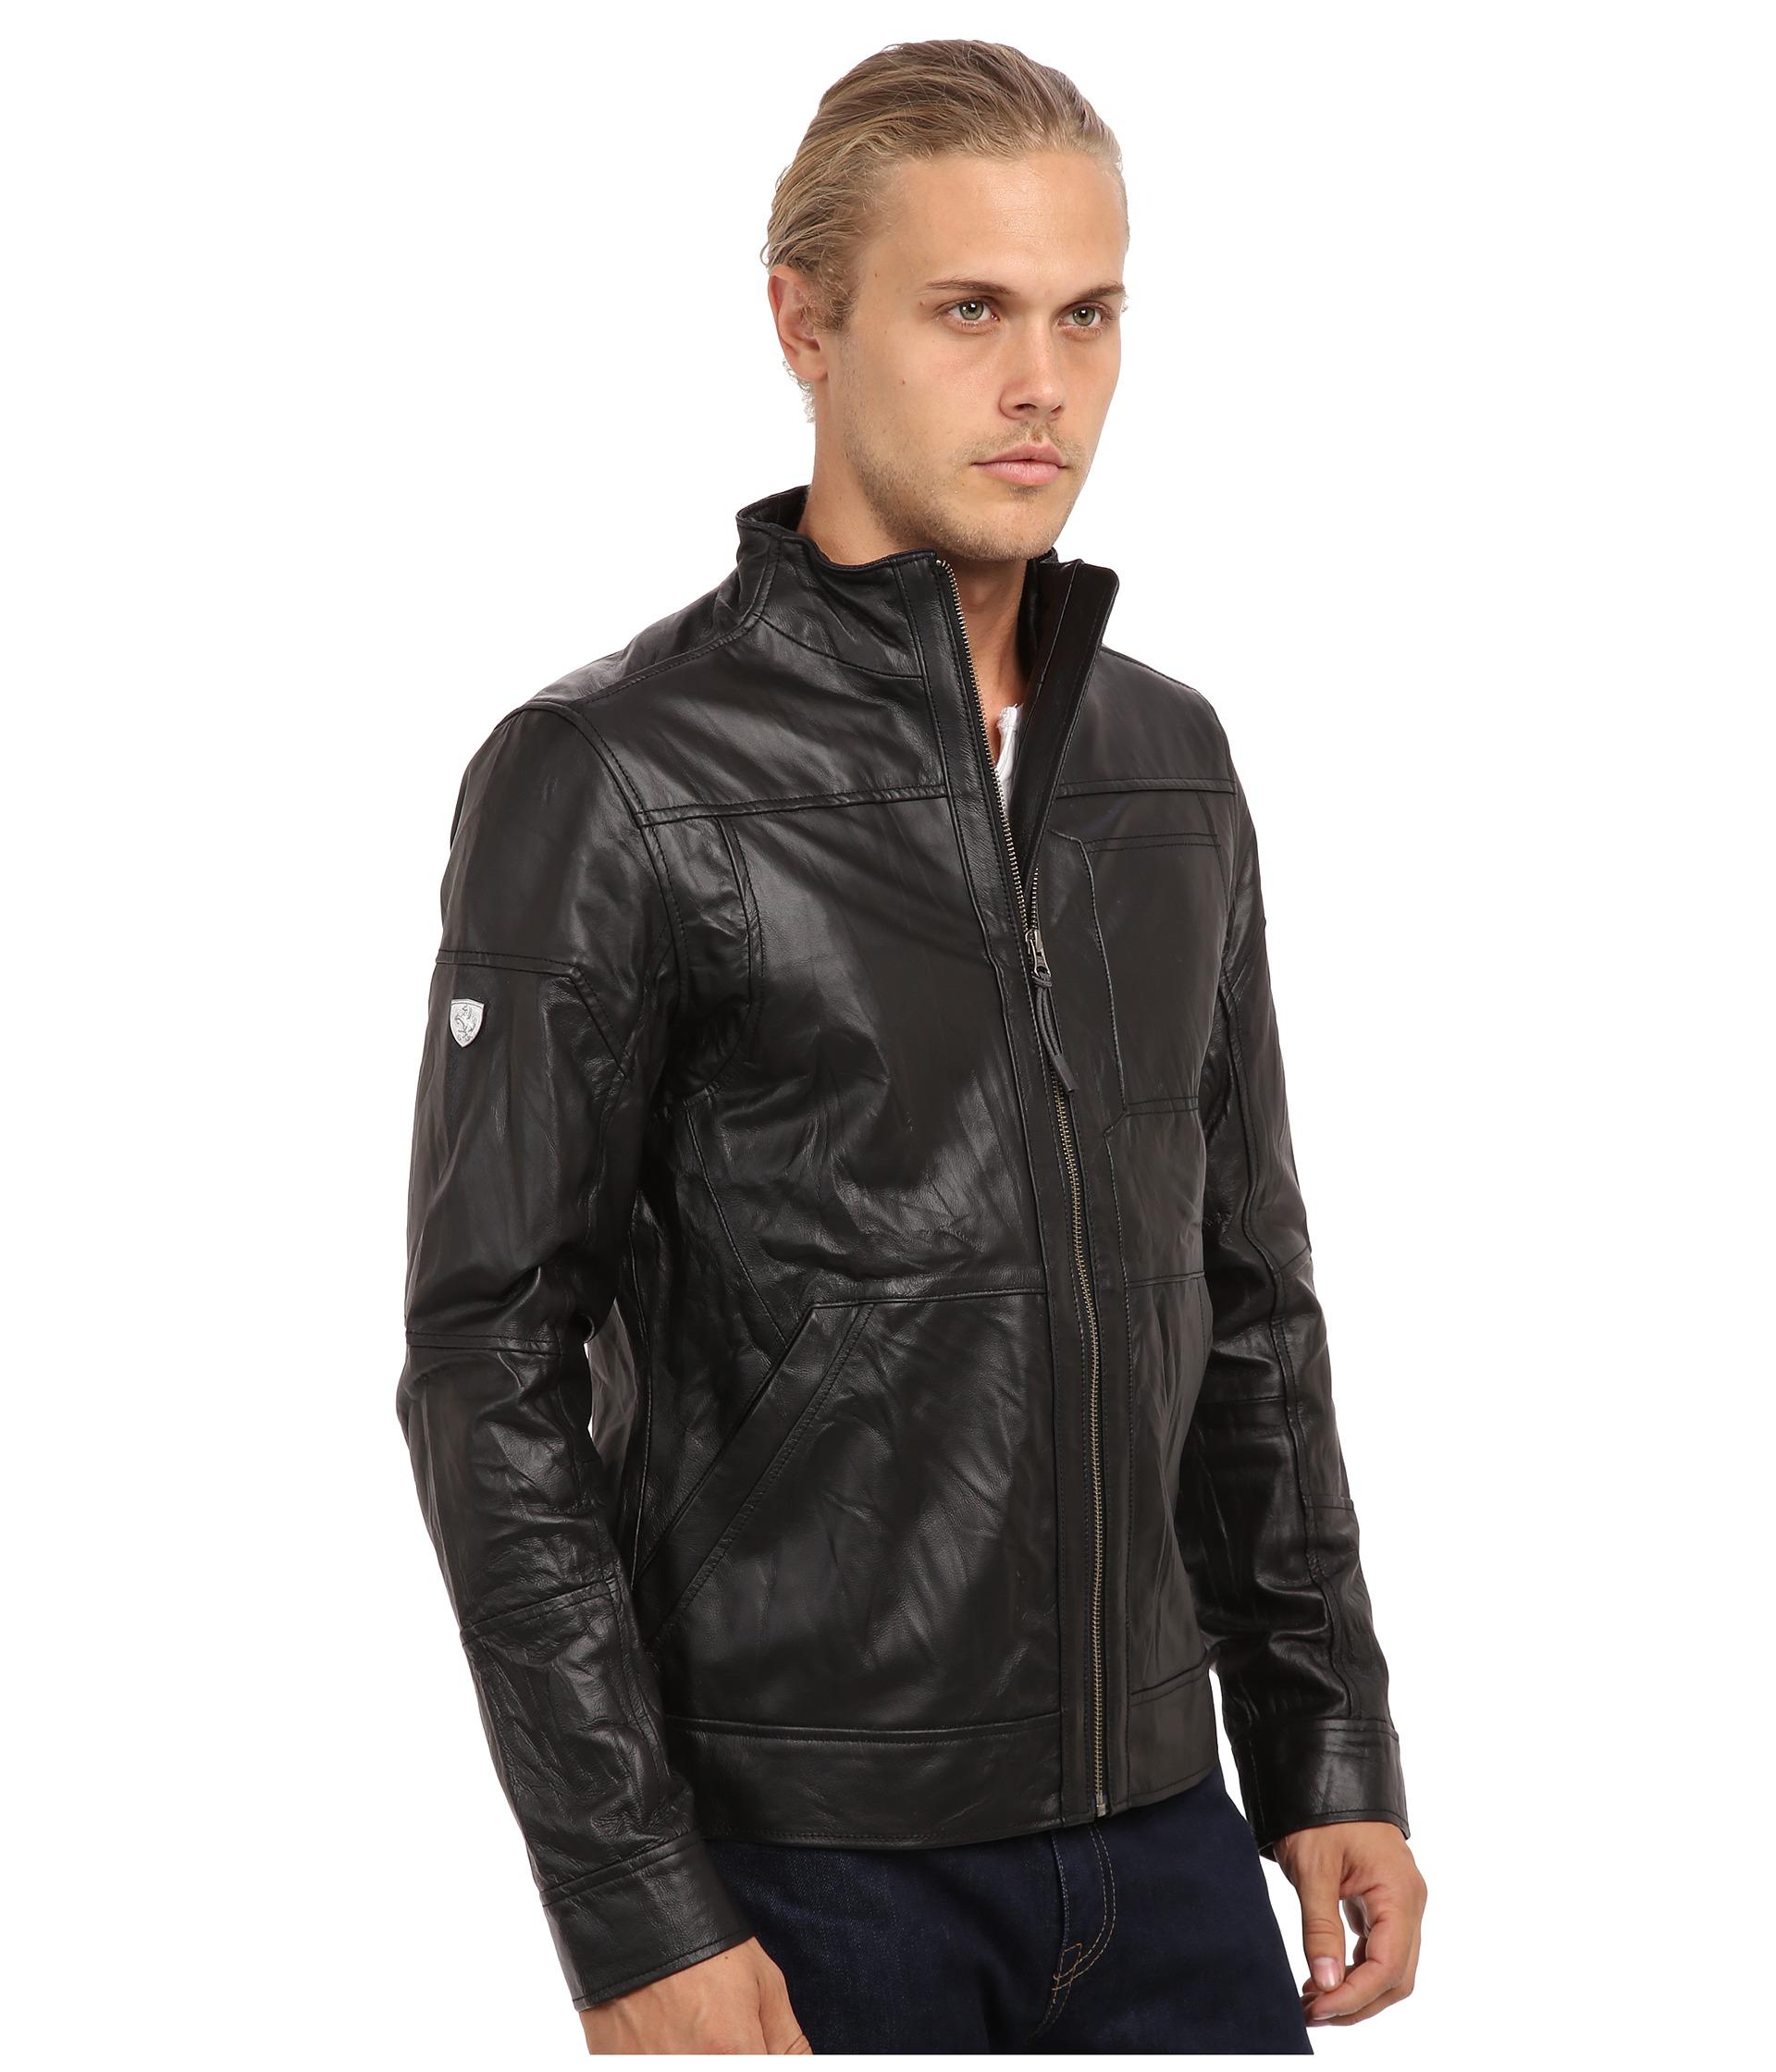 puma ferrari leather jacket shipped free at zappos. Black Bedroom Furniture Sets. Home Design Ideas